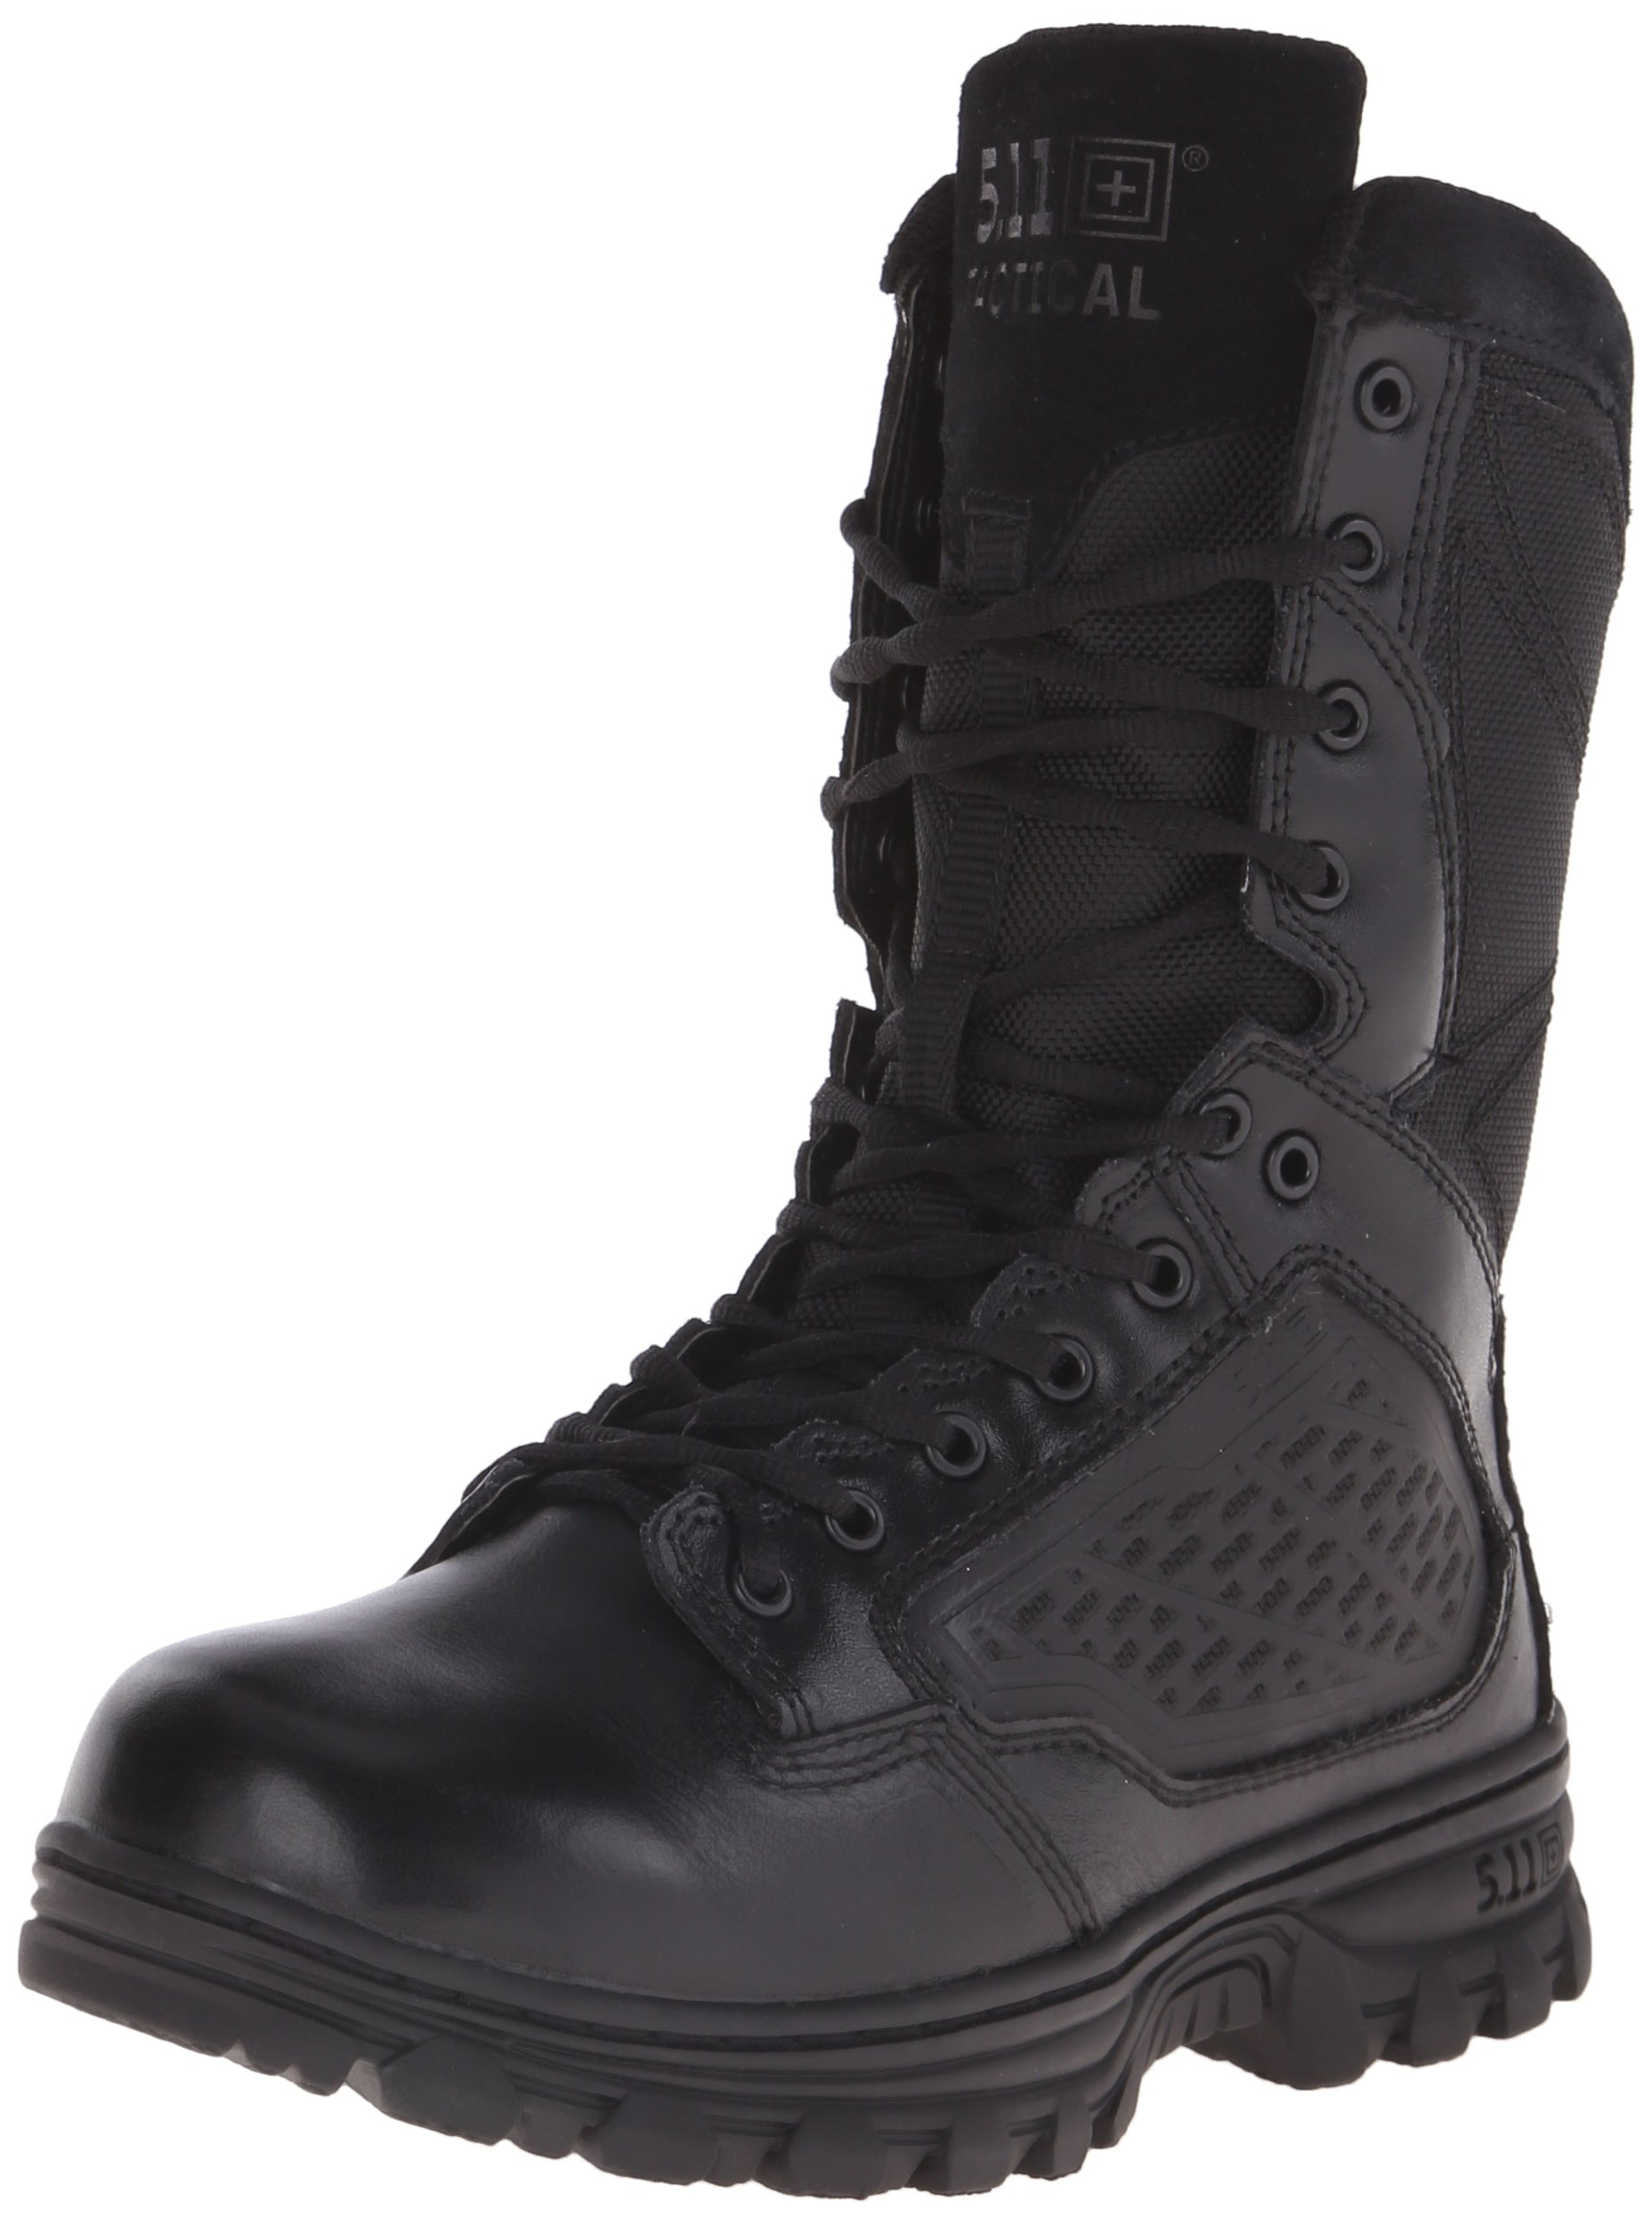 5.11 Men's Evo 8'' Side Zip Tactical Boot-M, Black, 10.5 D(M) US by 5.11